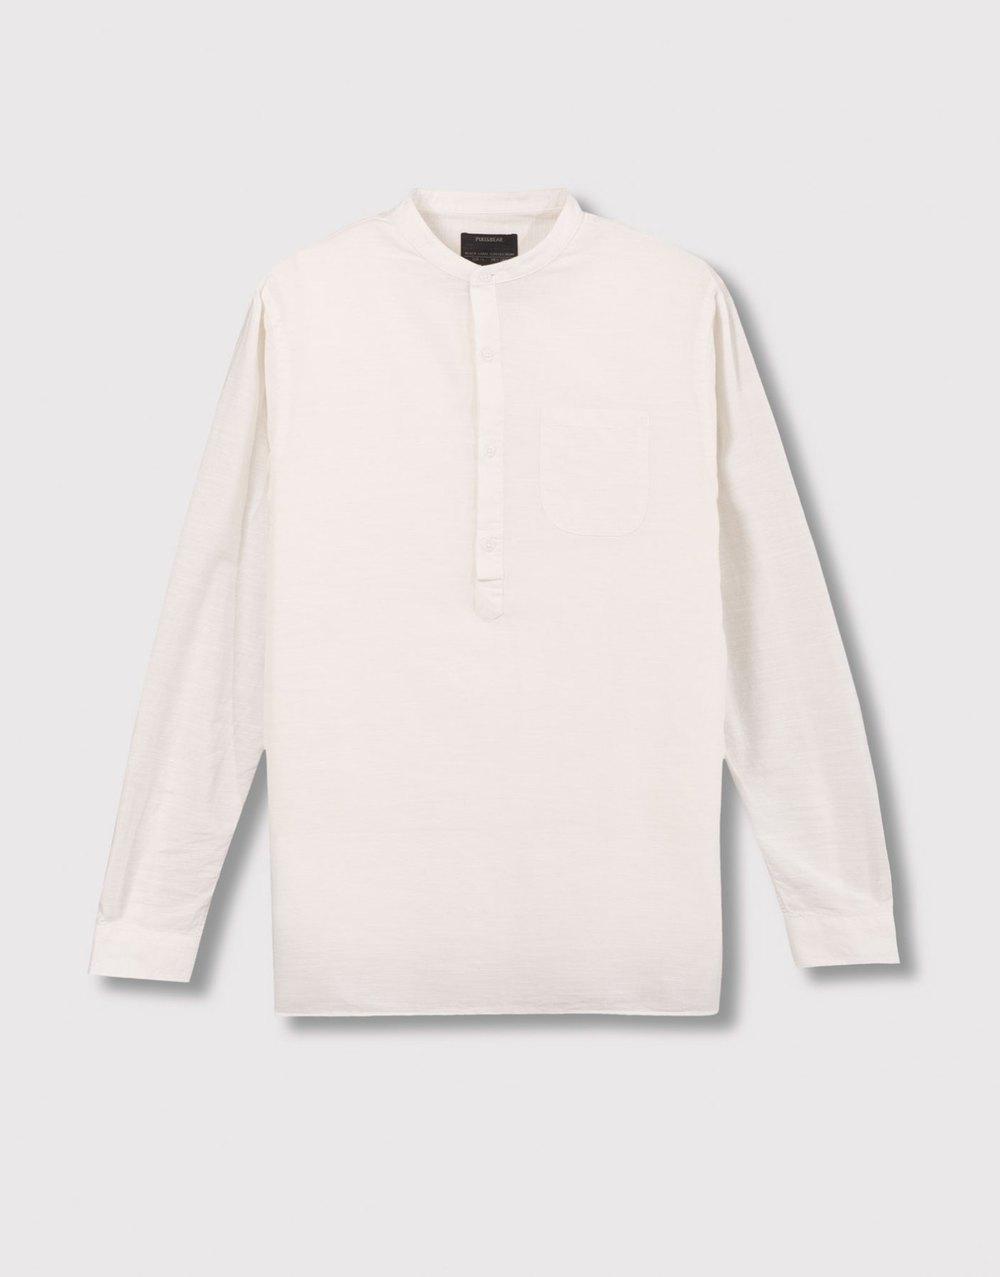 Mao collar shirt, £25.99 ( pullandbear.com )